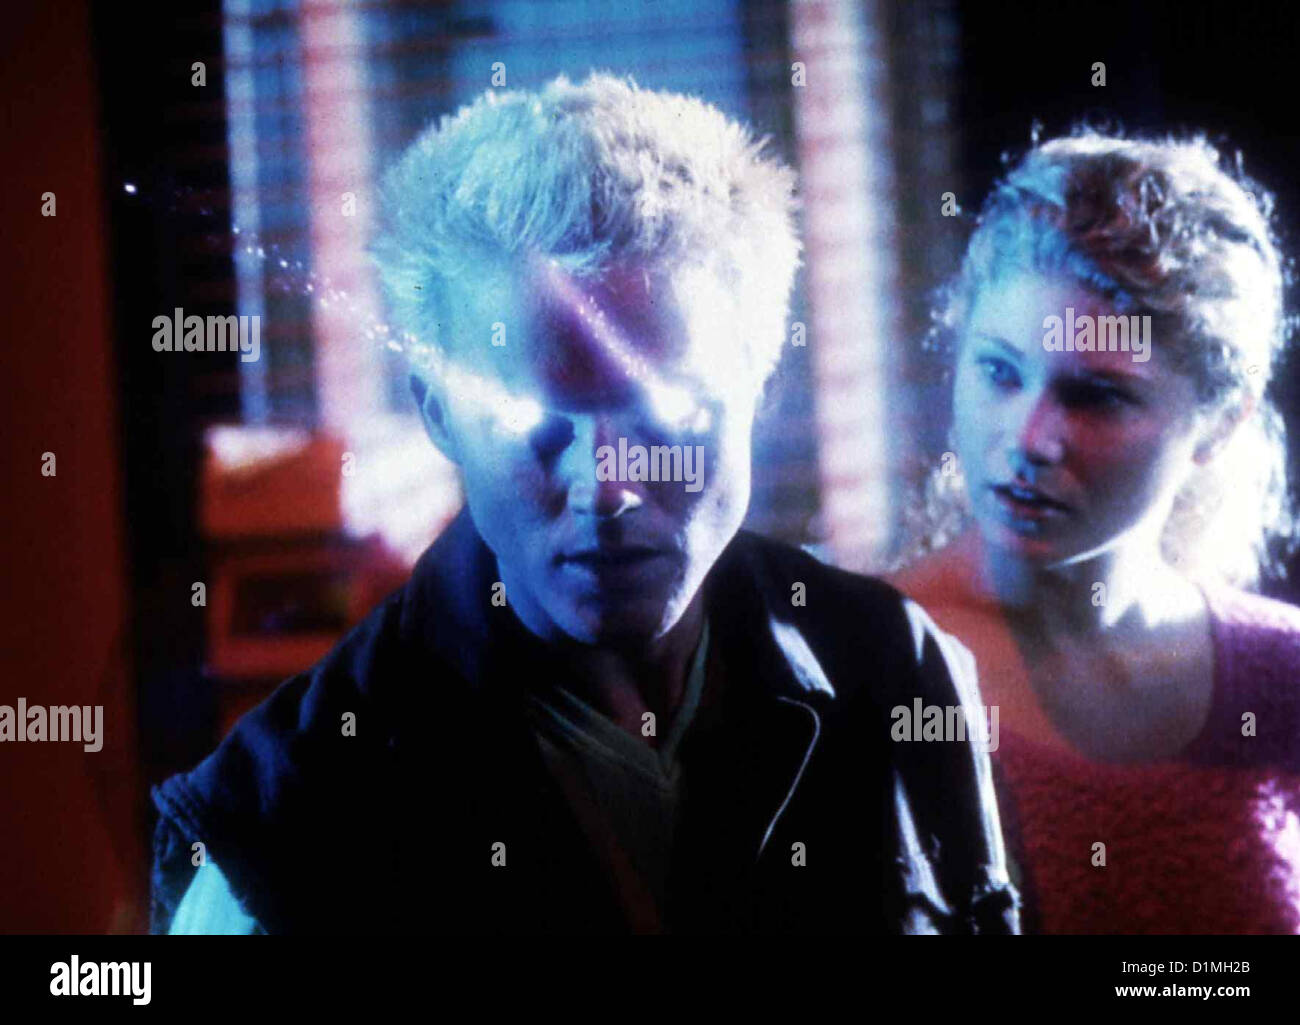 Generation X   Generation X   Randall Slavin, Suzanne Davis *** Local Caption *** 1996  -- - Stock Image